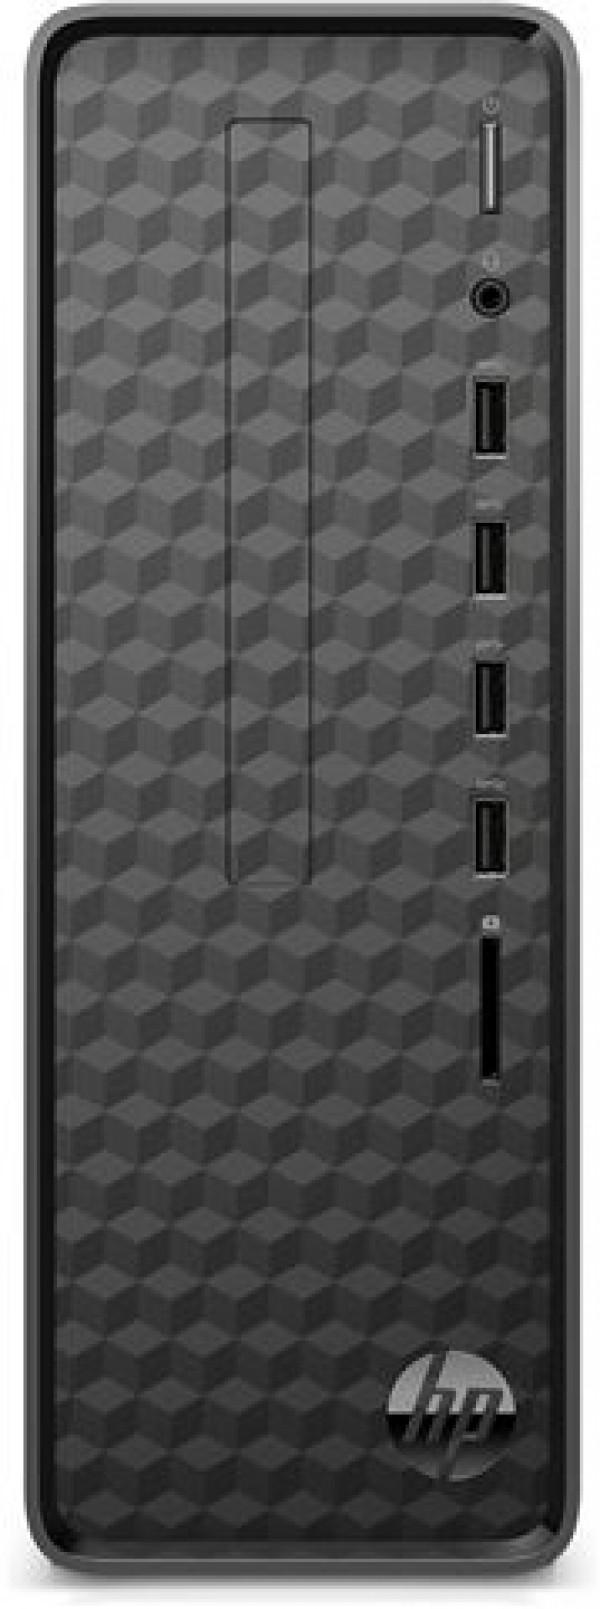 HP DES slim S01-aD0000ny Cell J4005 4G128, 107F9EA